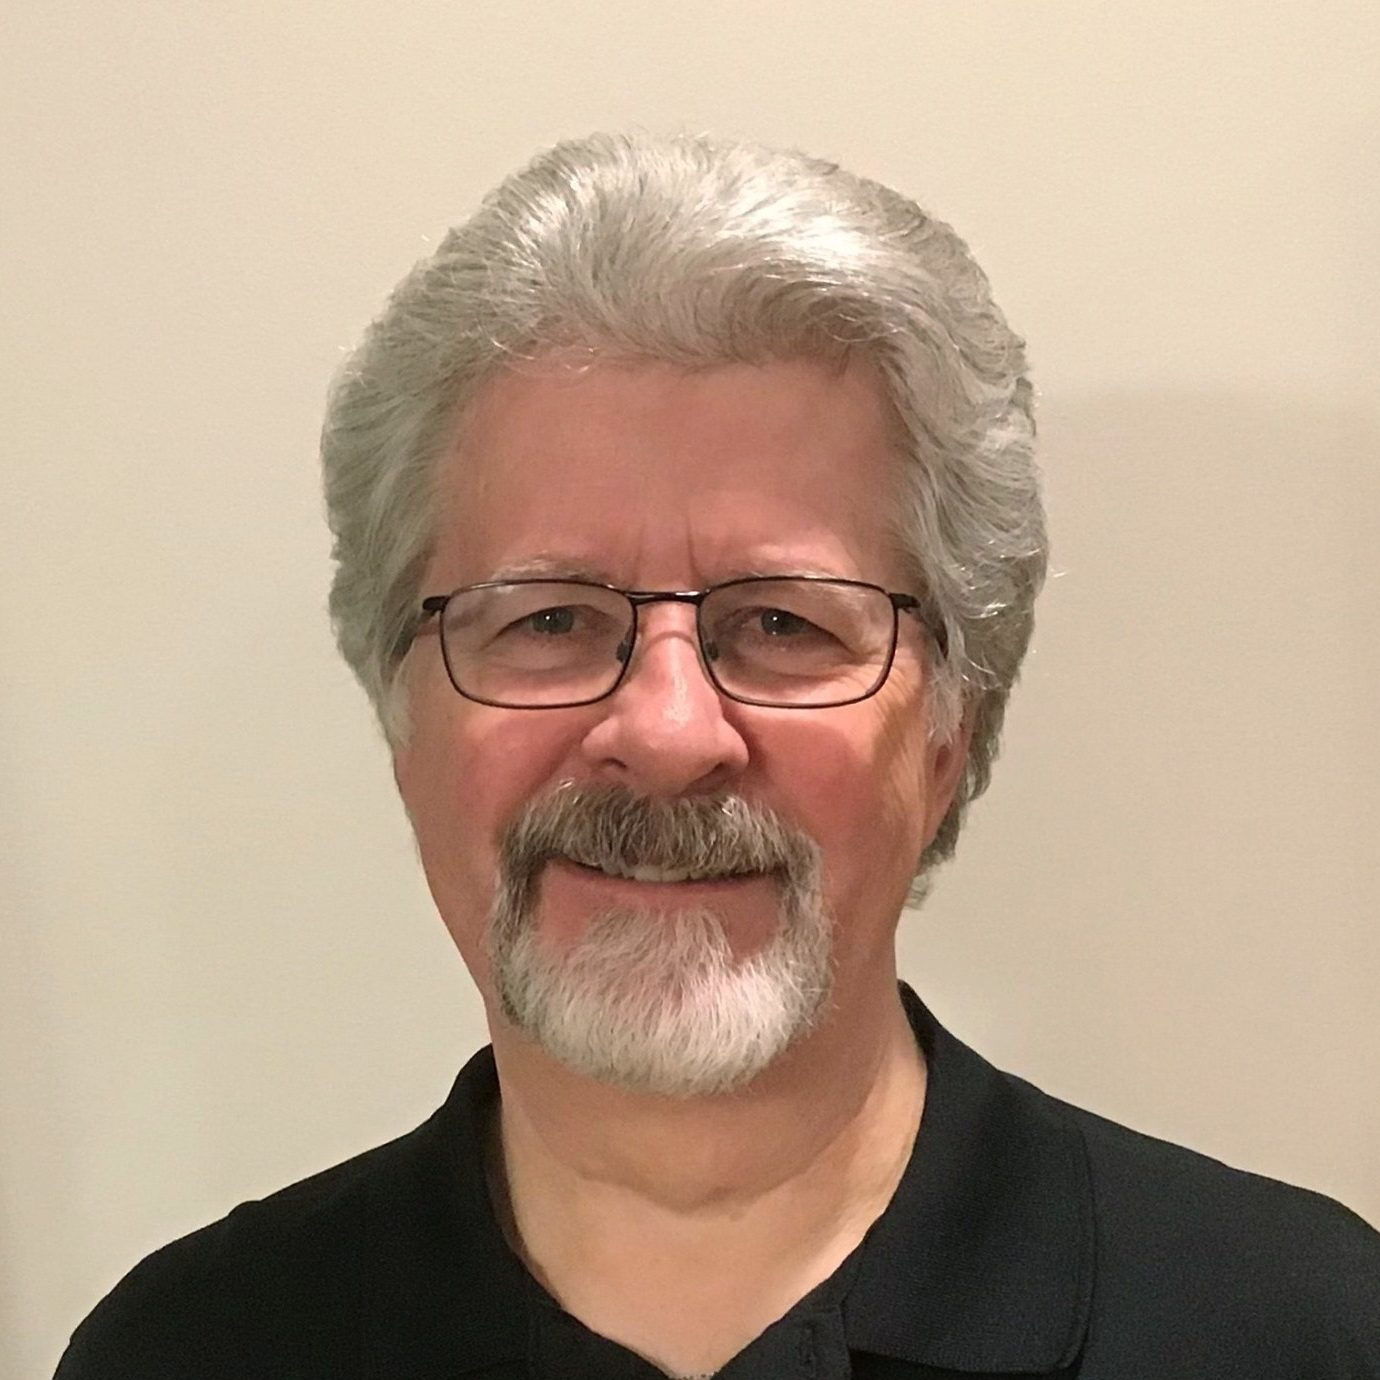 Greg, Technician